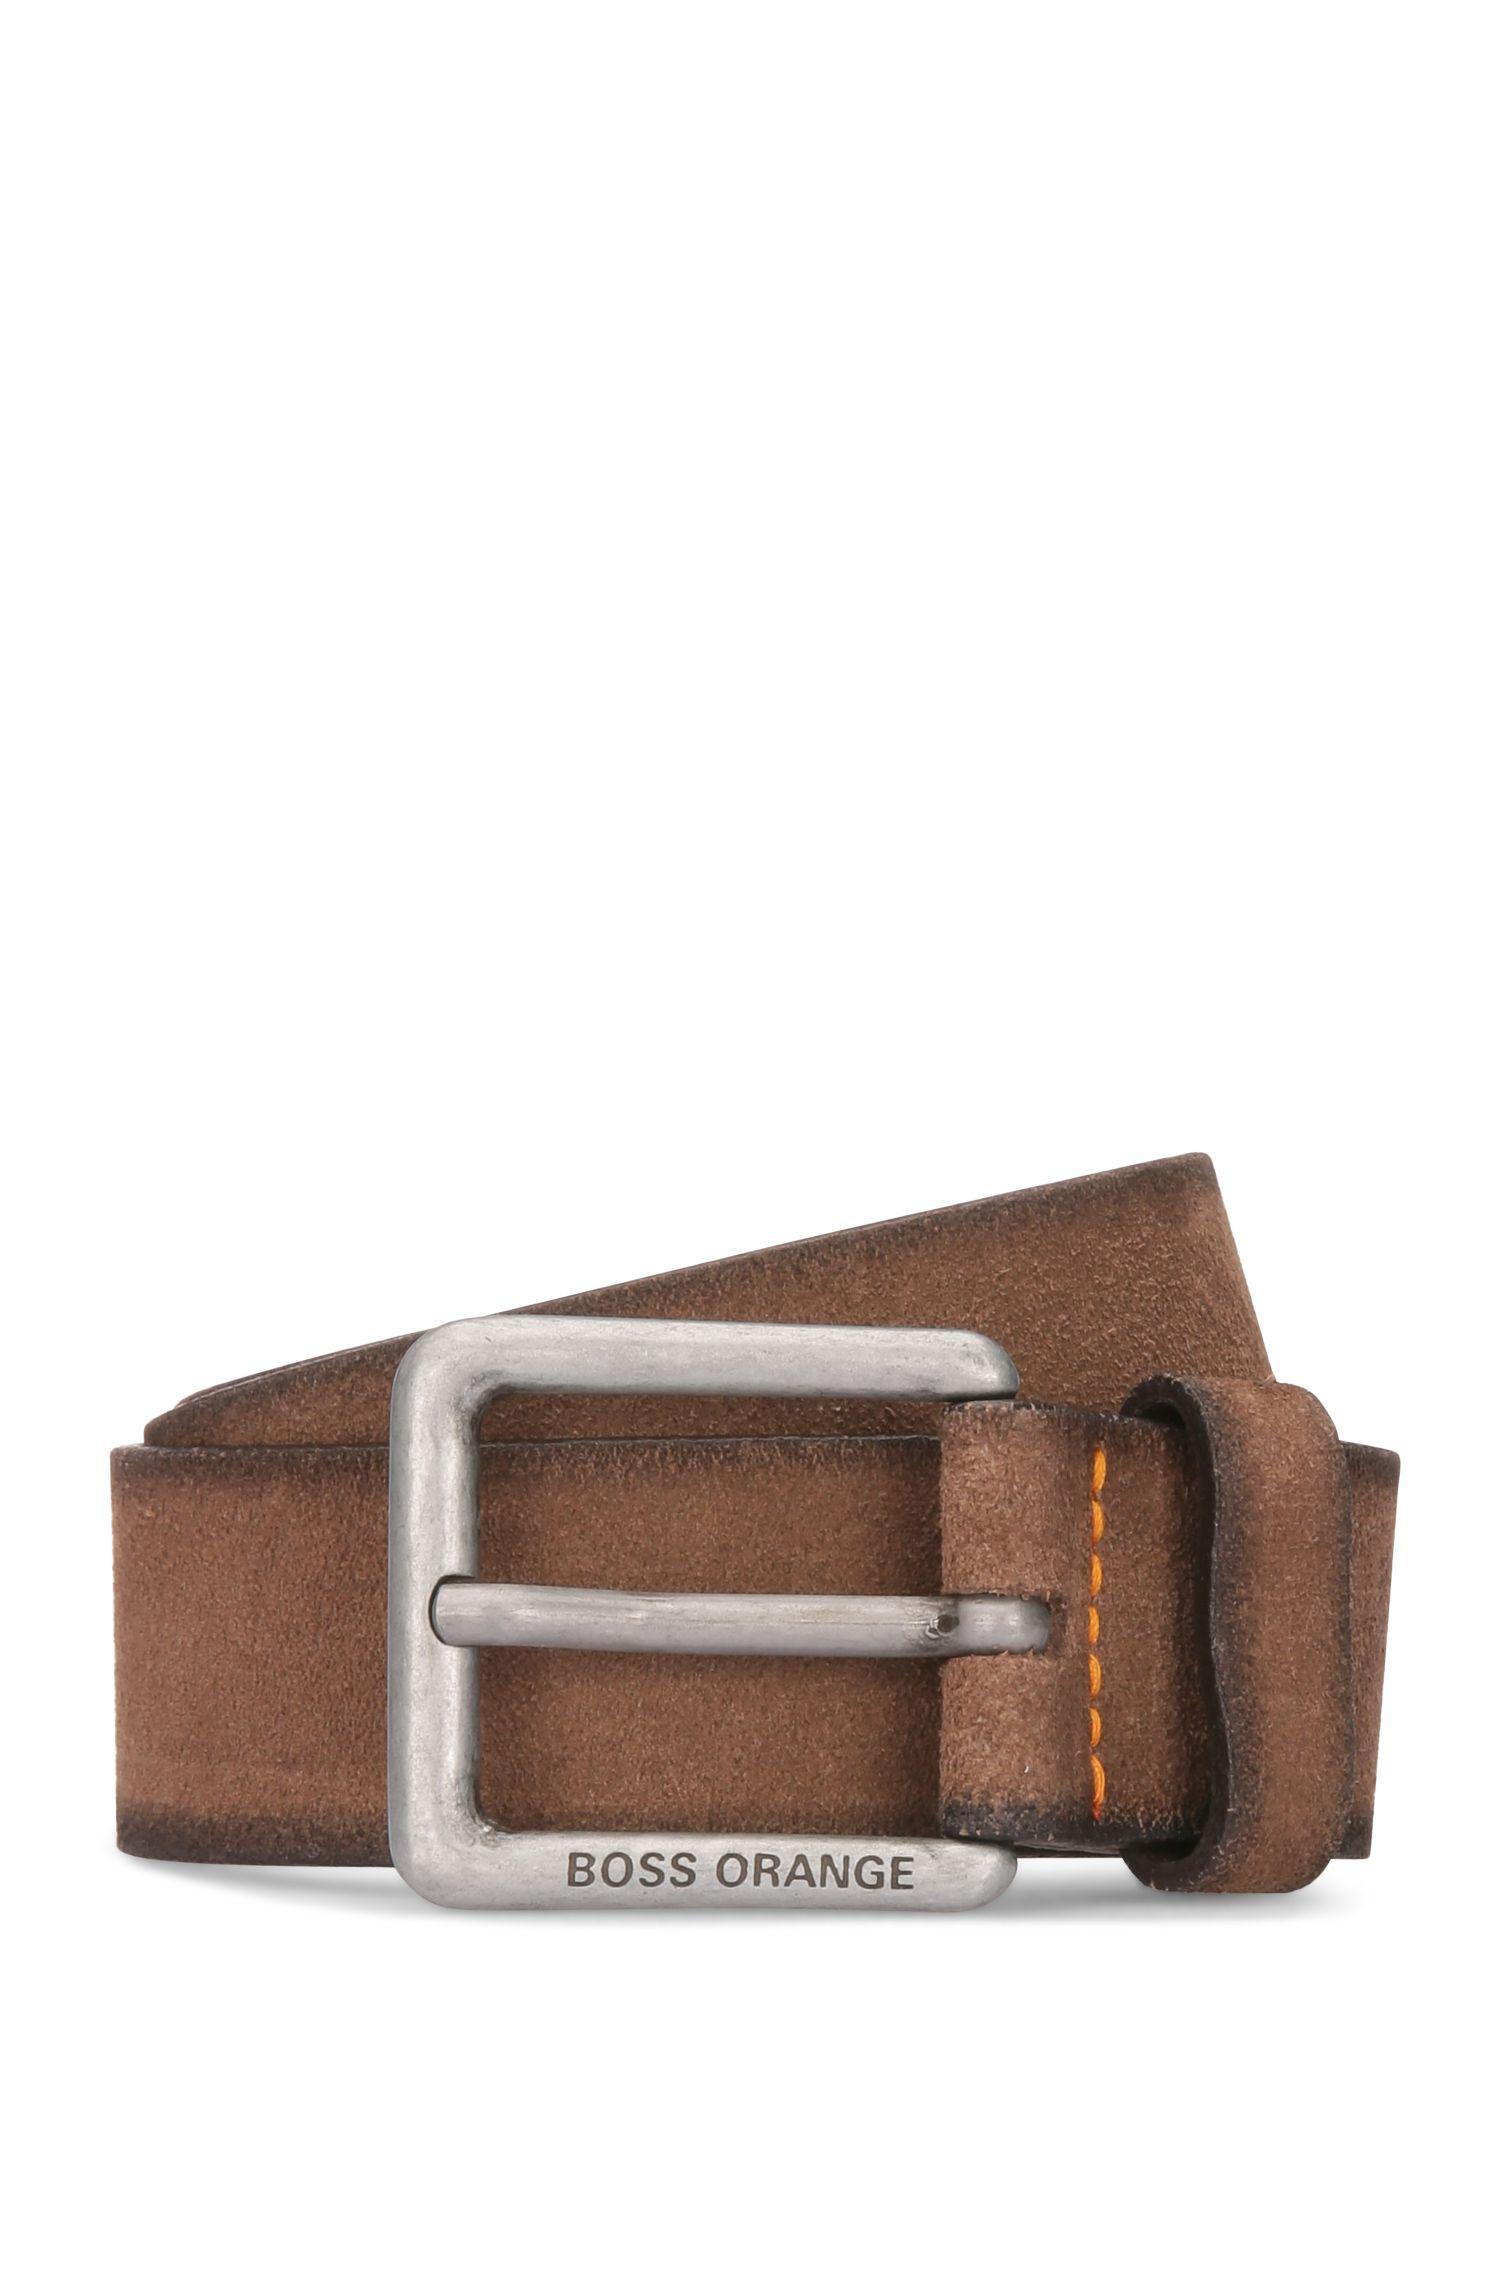 Gürtel aus Veloursleder mit Naht-Details